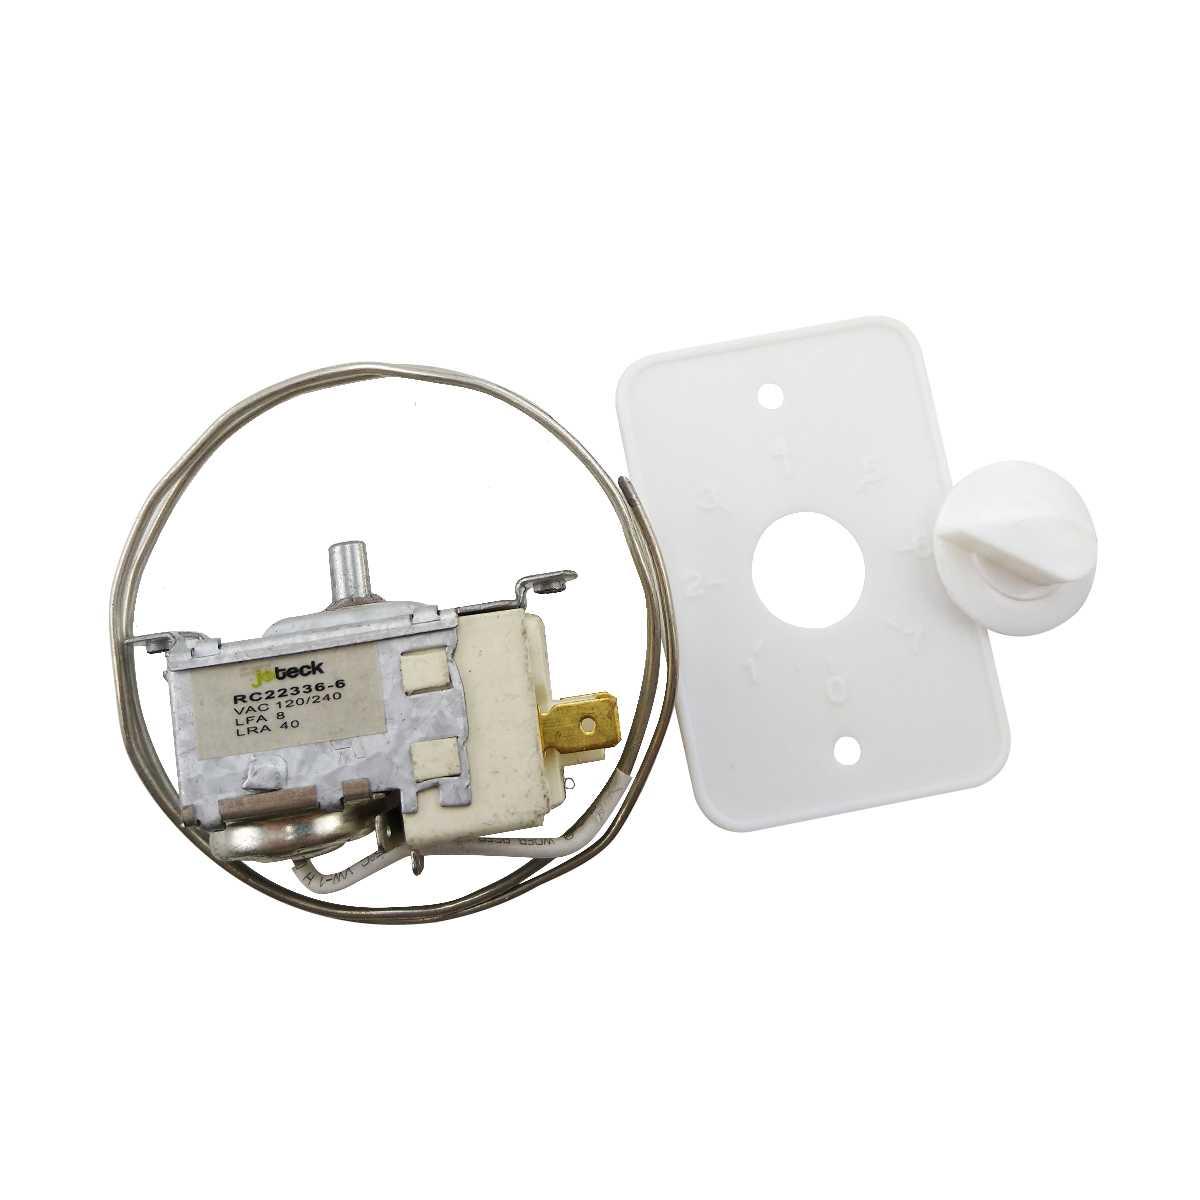 Termostato Compativel geladeira CCE C35, T43 RC22336-6